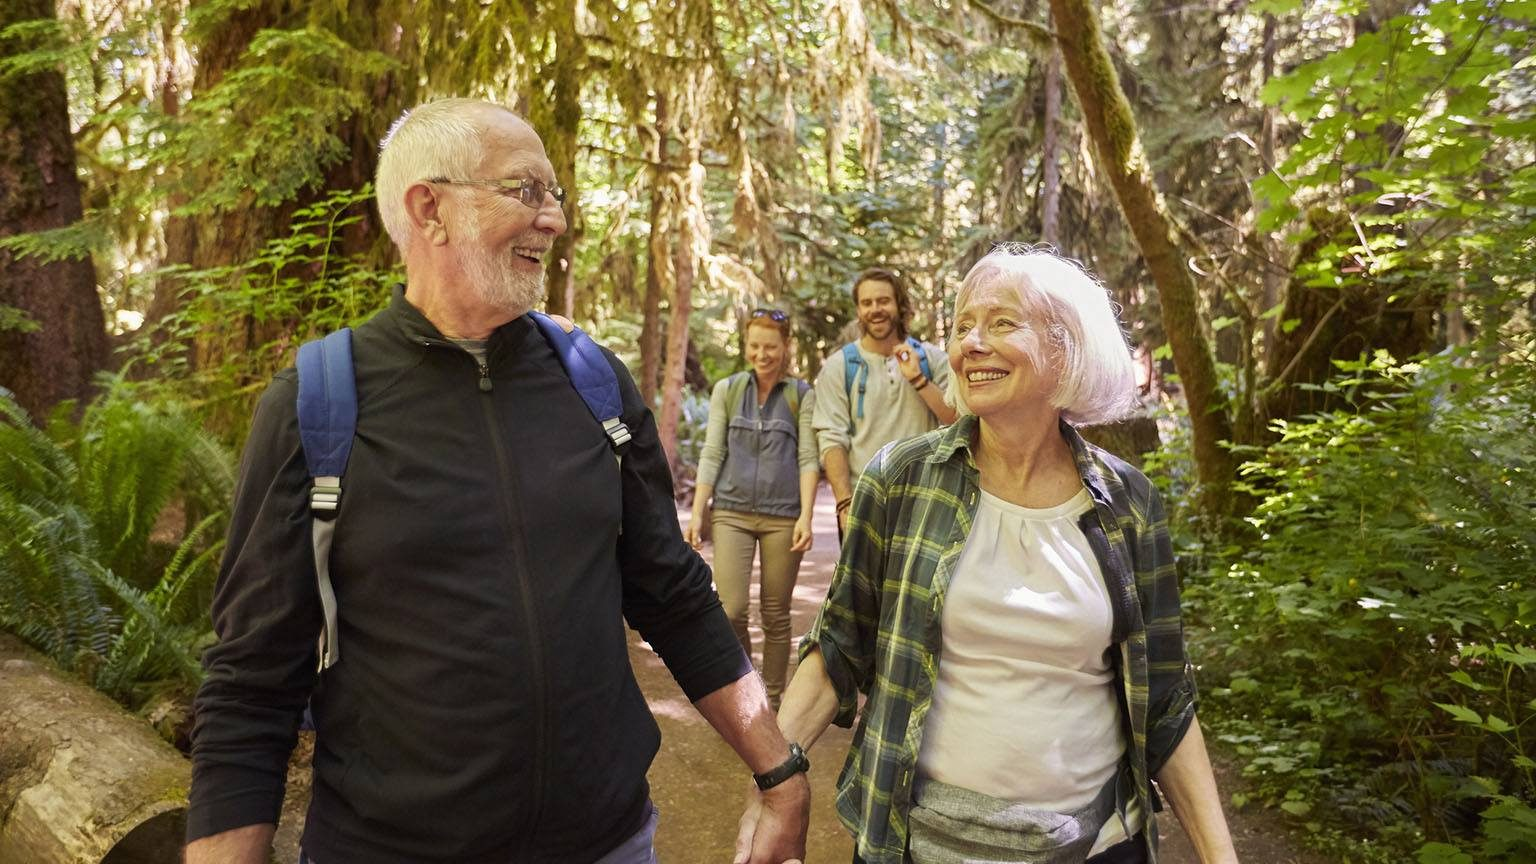 Seniors hiking